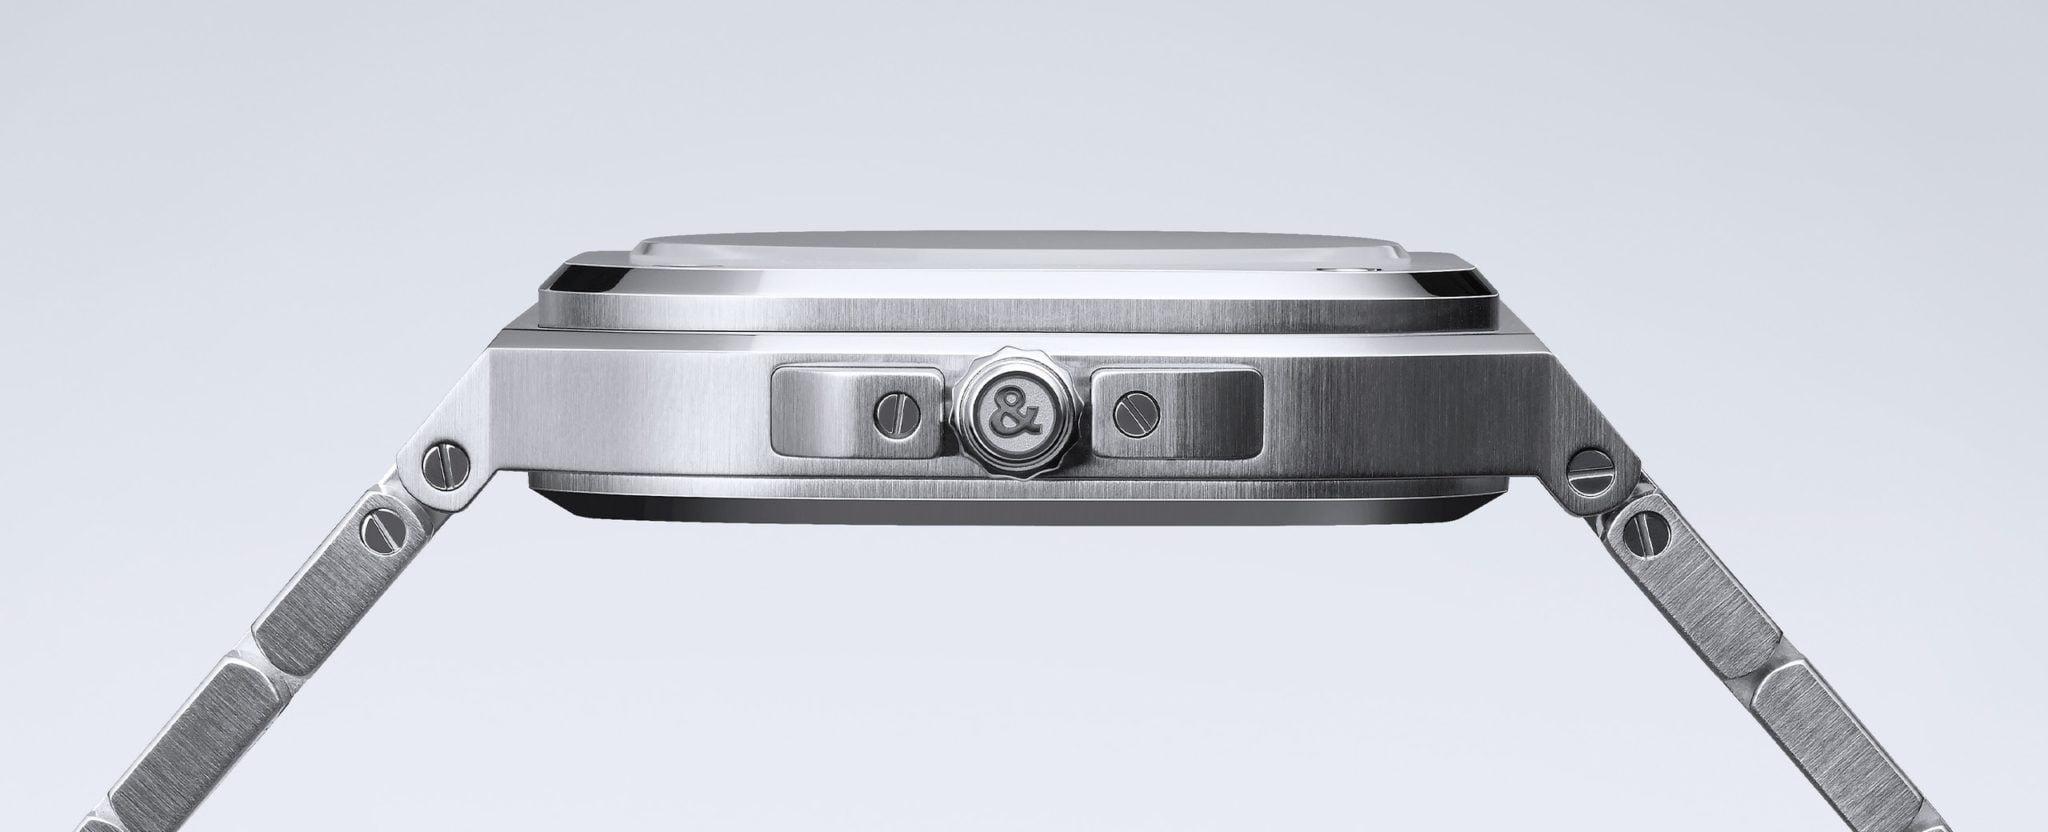 Bell & Ross BR 05 integrated steel bracelet